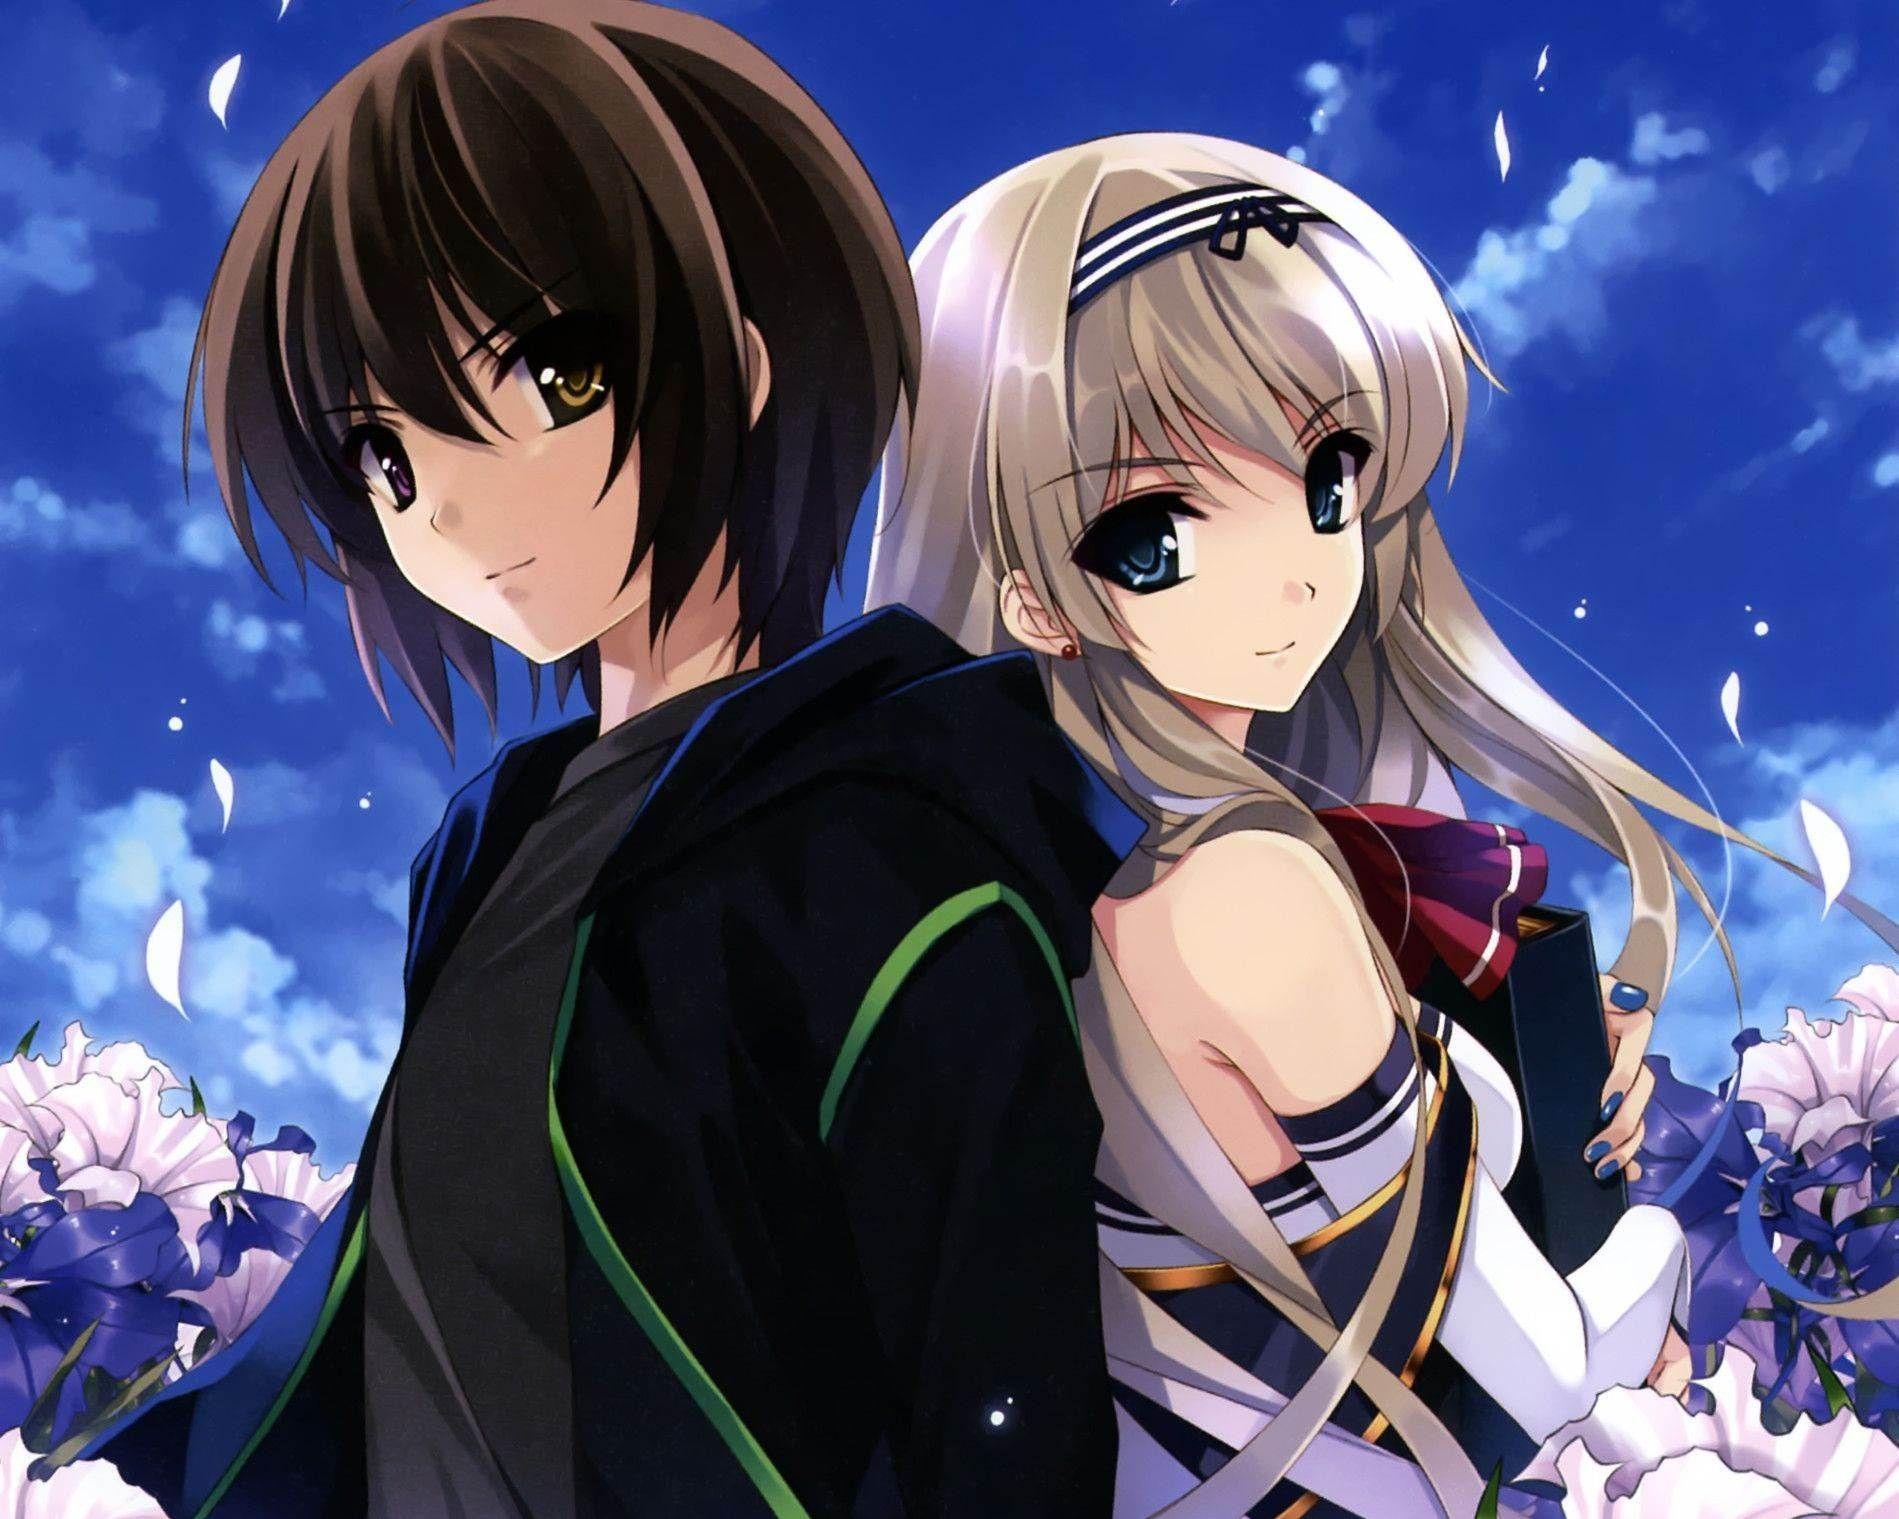 Anime Couple Hd Wallpapers On Wallpaperdog